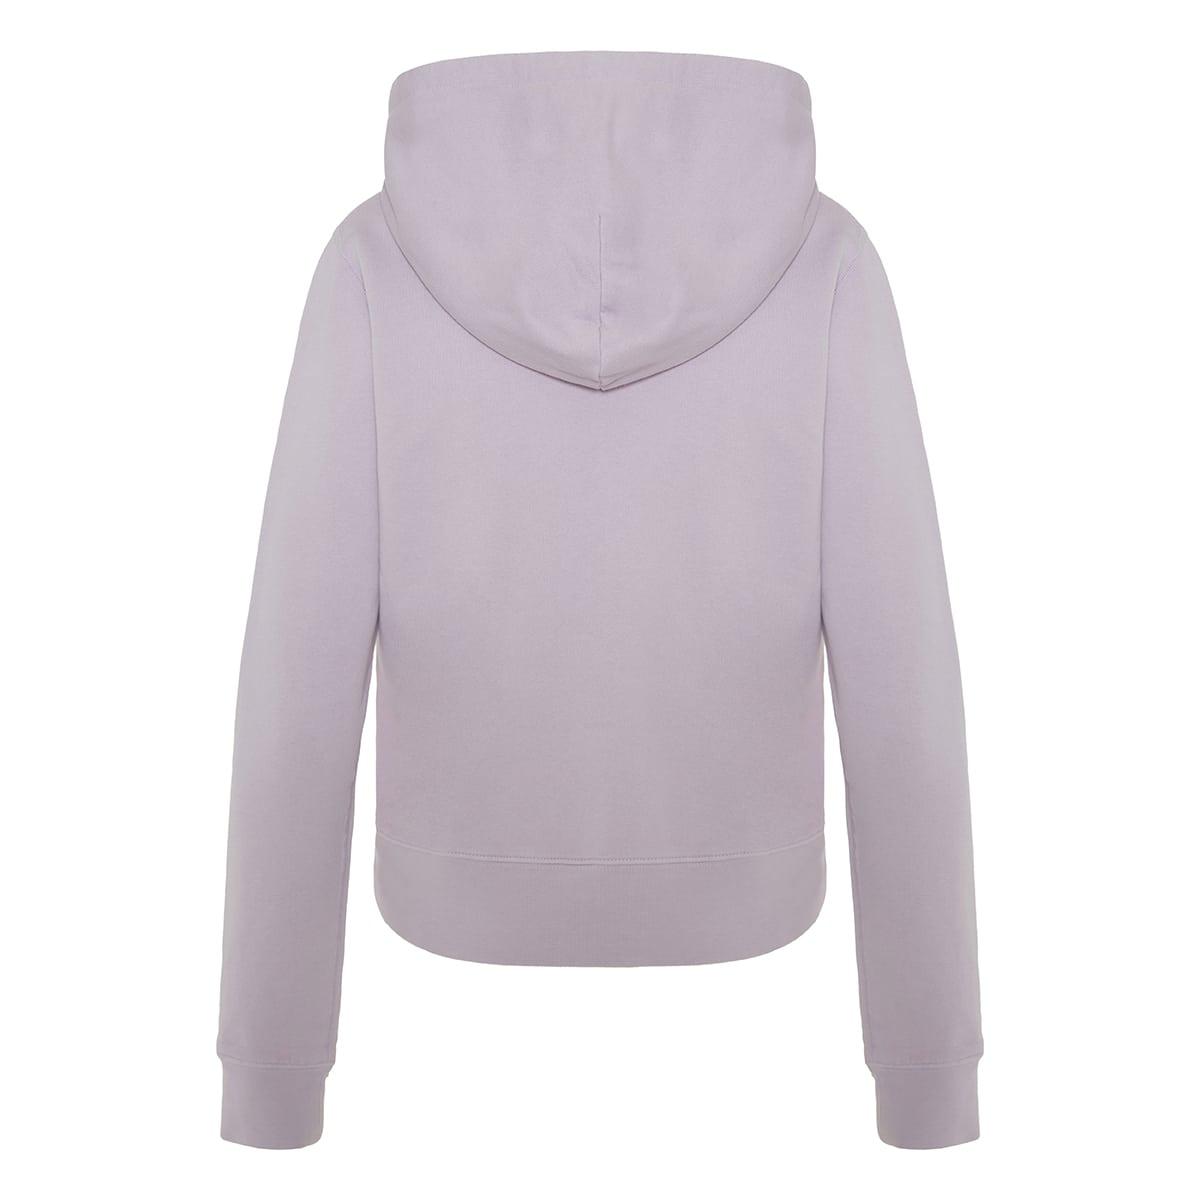 Callie zipper hoodie